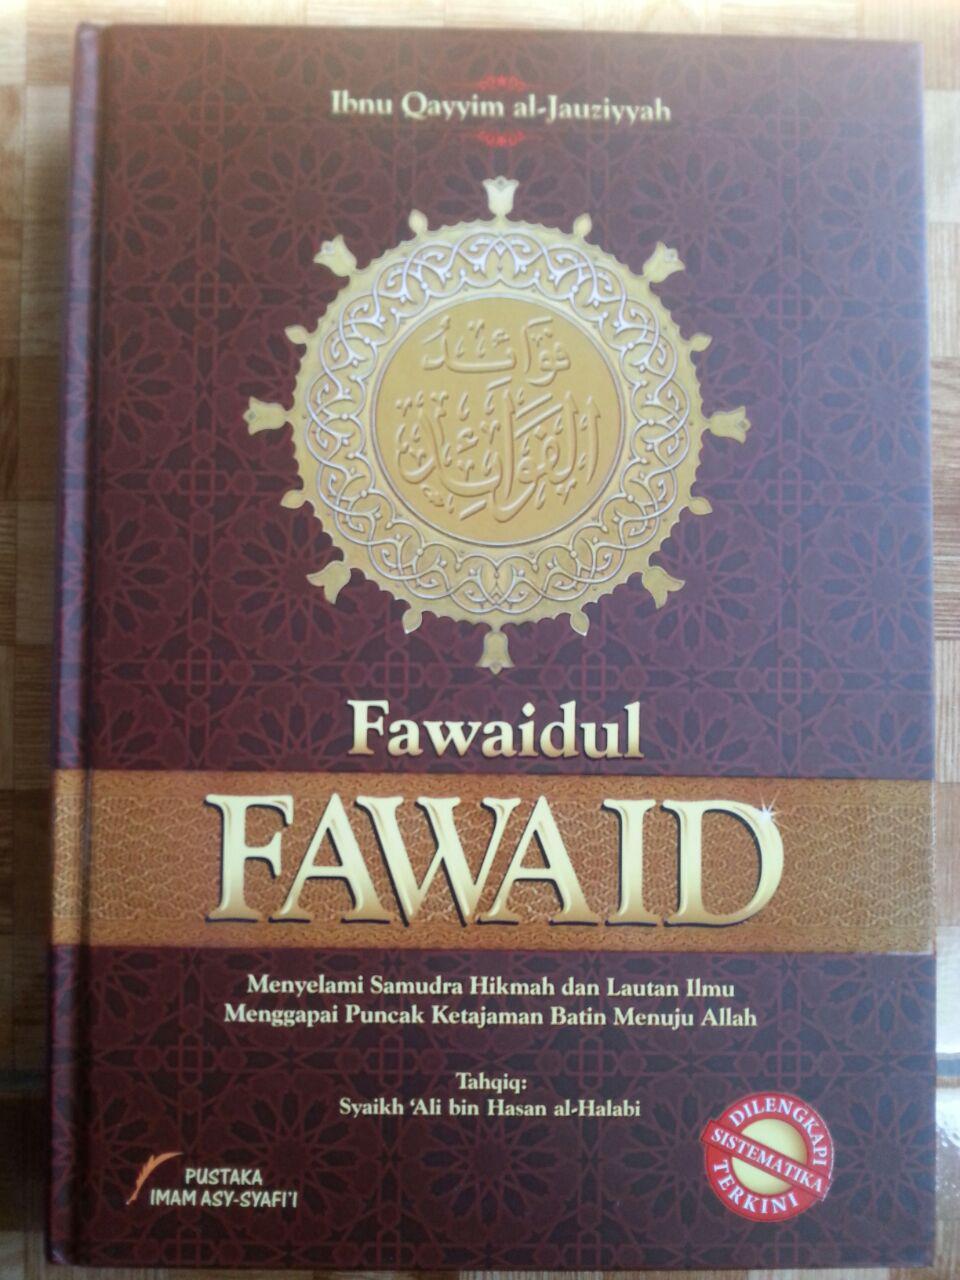 Buku Fawaidul Fawaid cover 2